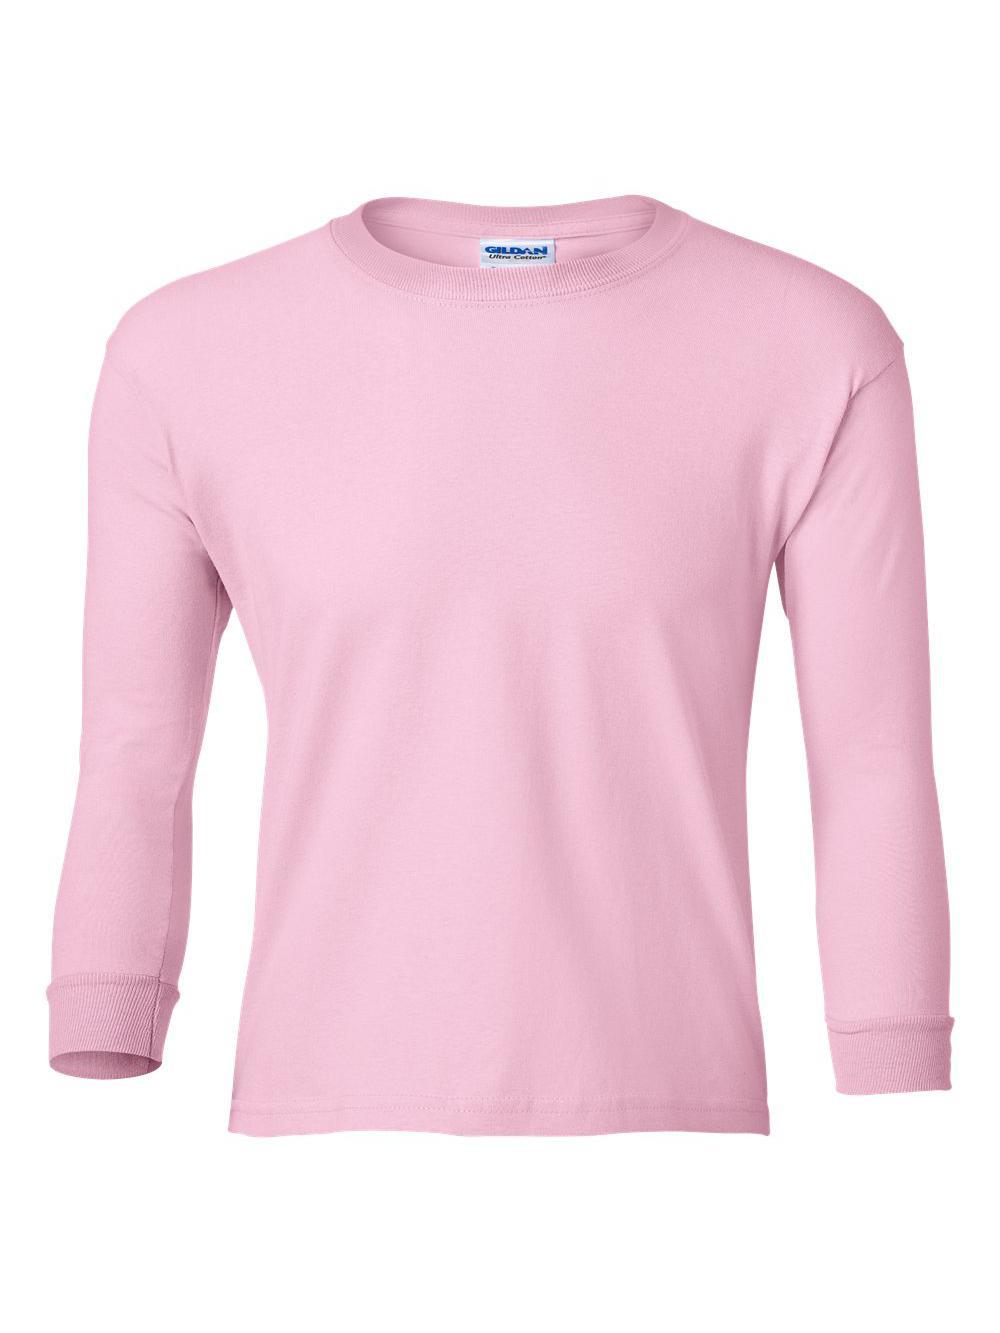 Gildan-Ultra-Cotton-Youth-Long-Sleeve-T-Shirt-2400B thumbnail 18